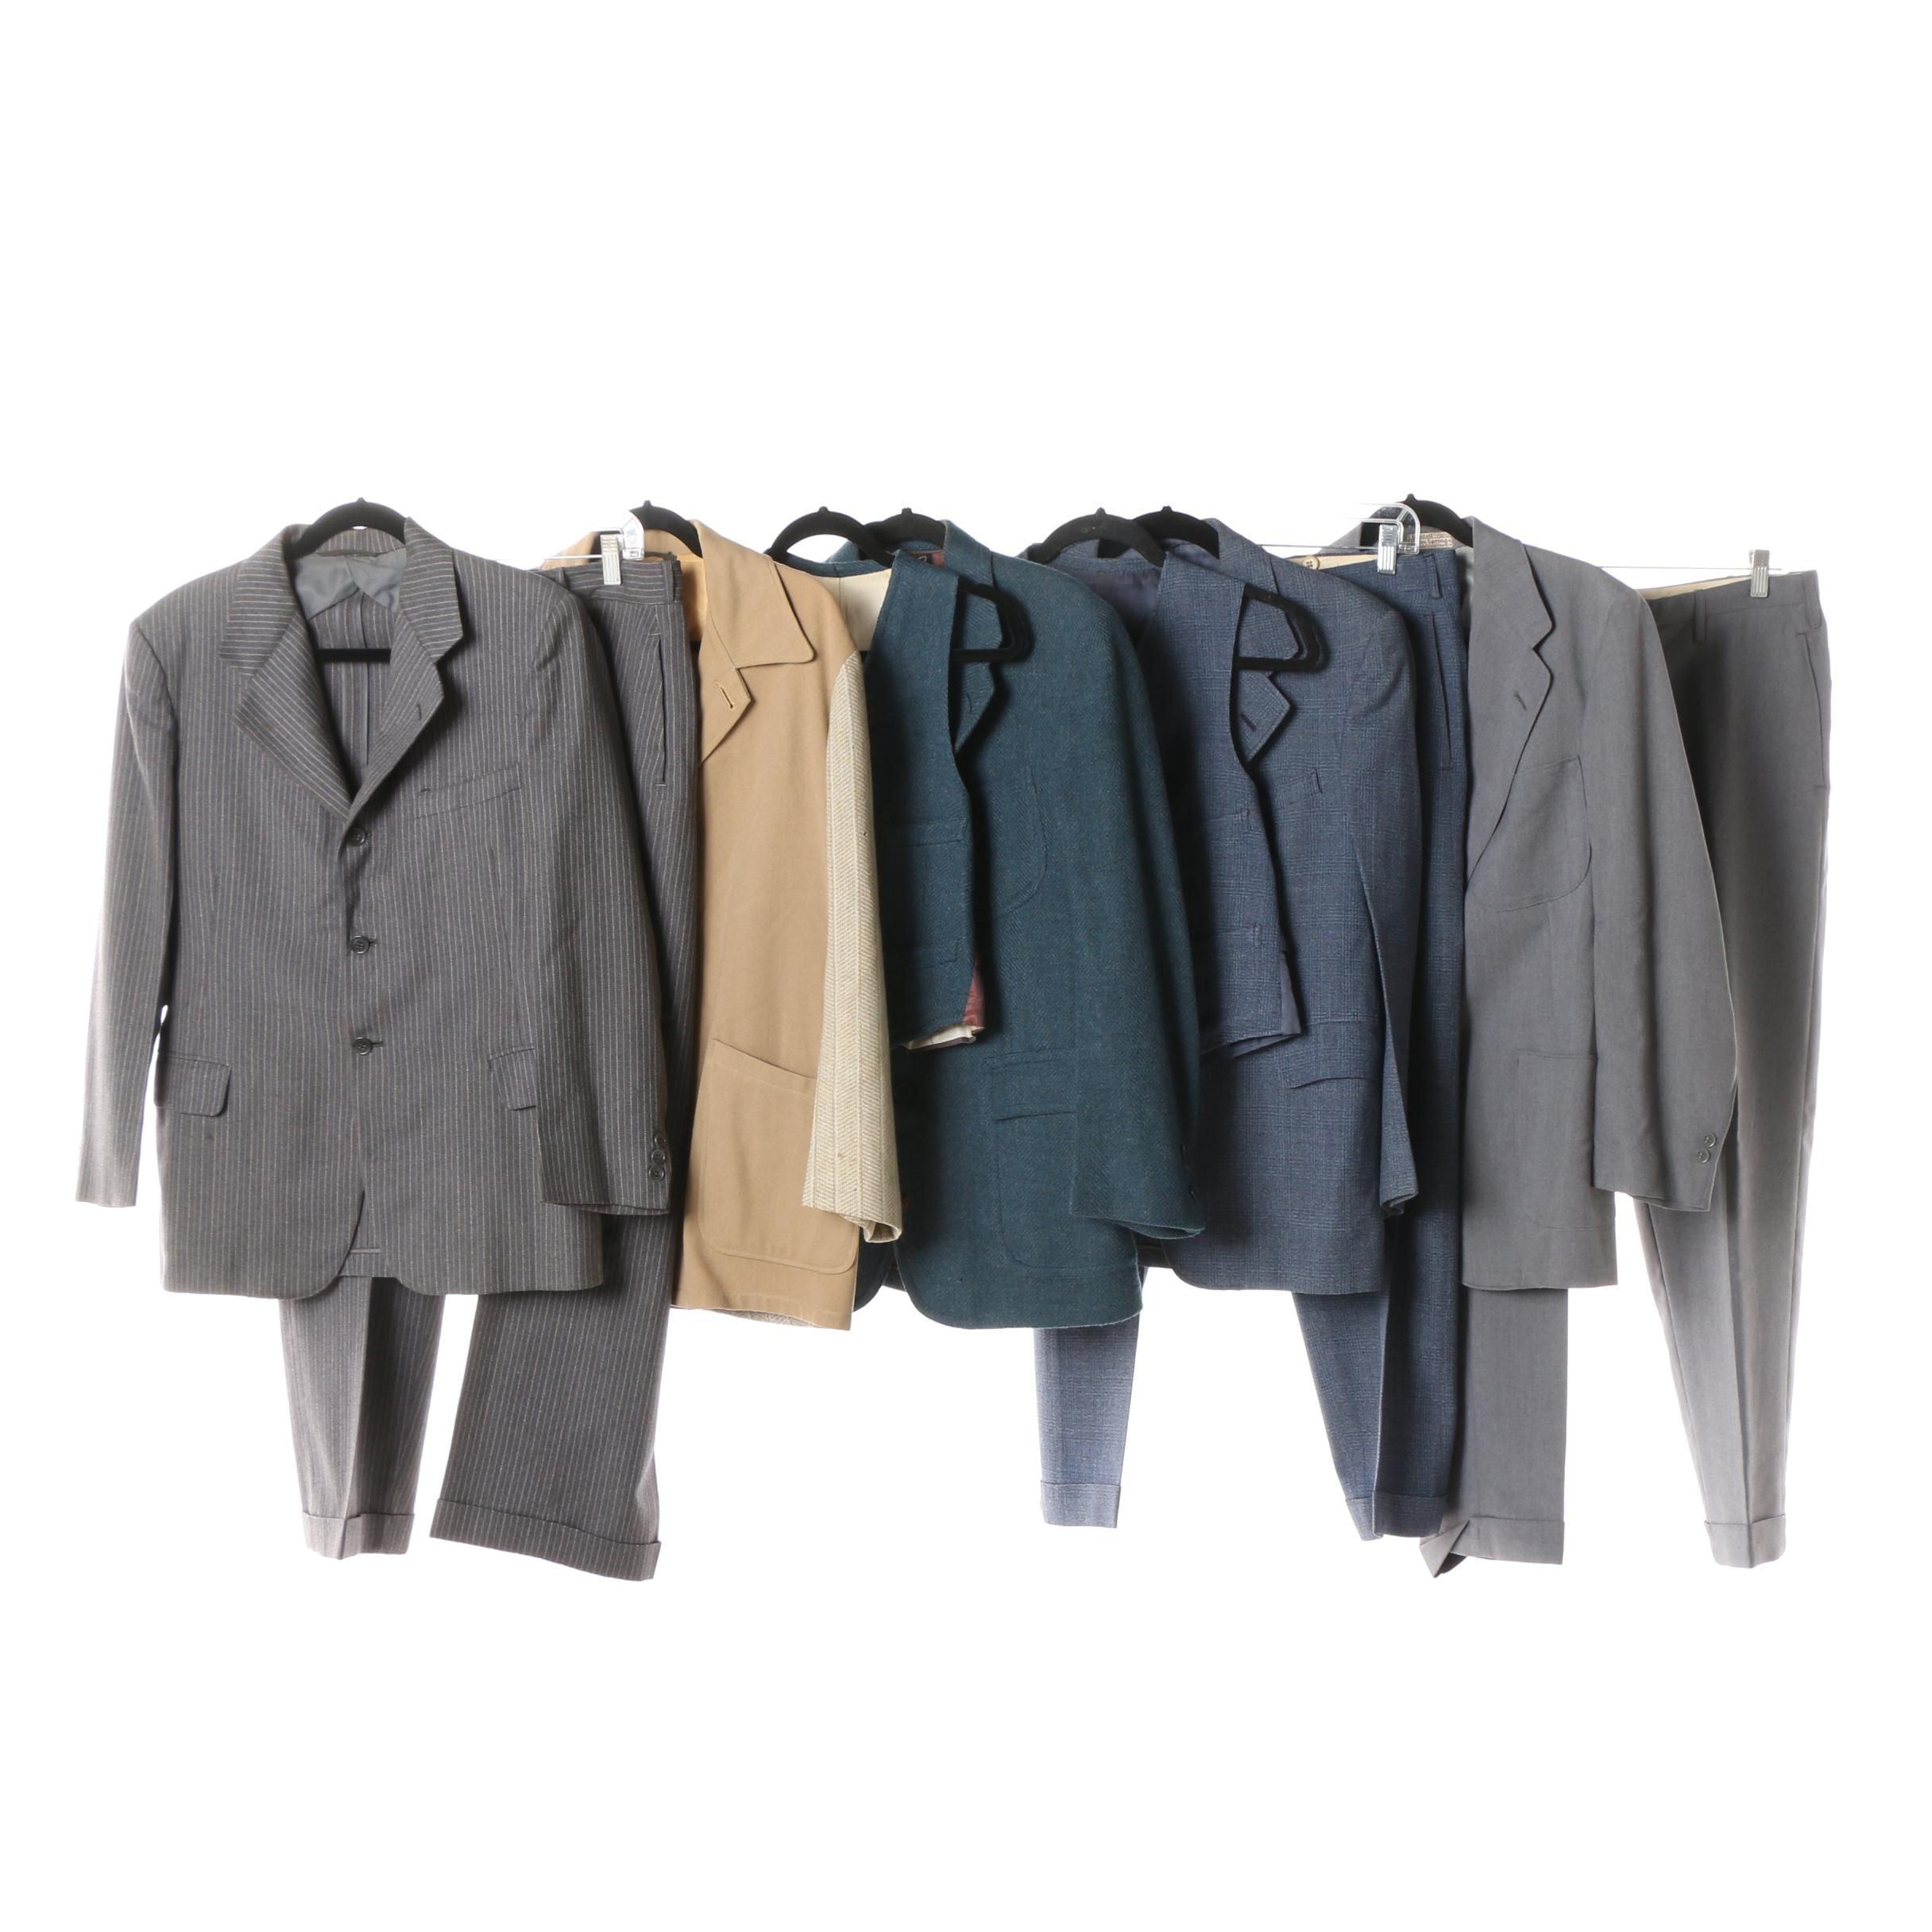 Men's Vintage Suits and Separates